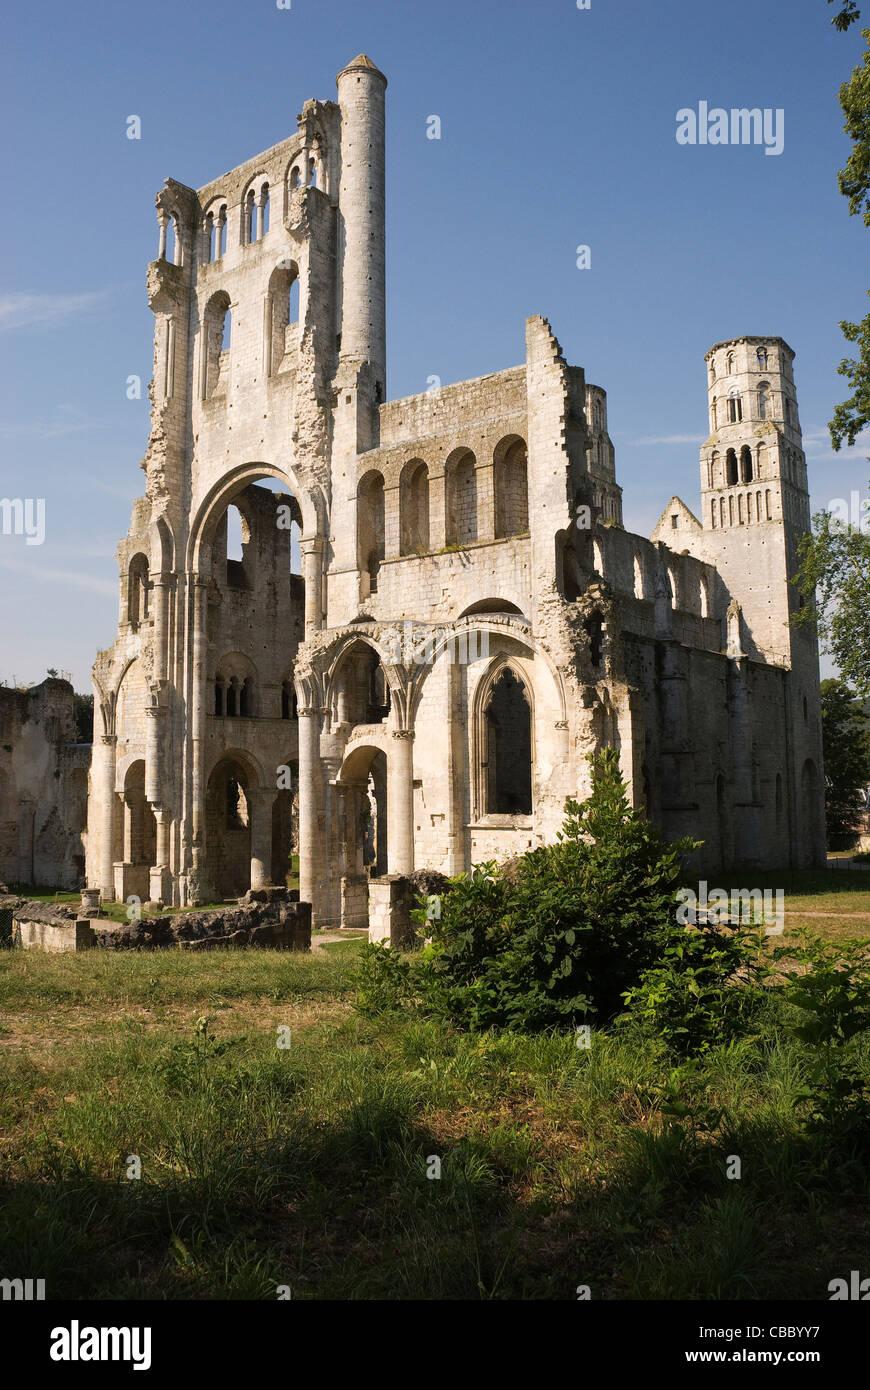 Elk196-1168v France, Normandy, Jumieges Abbey, Eglise Notre Dame 1067 Stock Photo